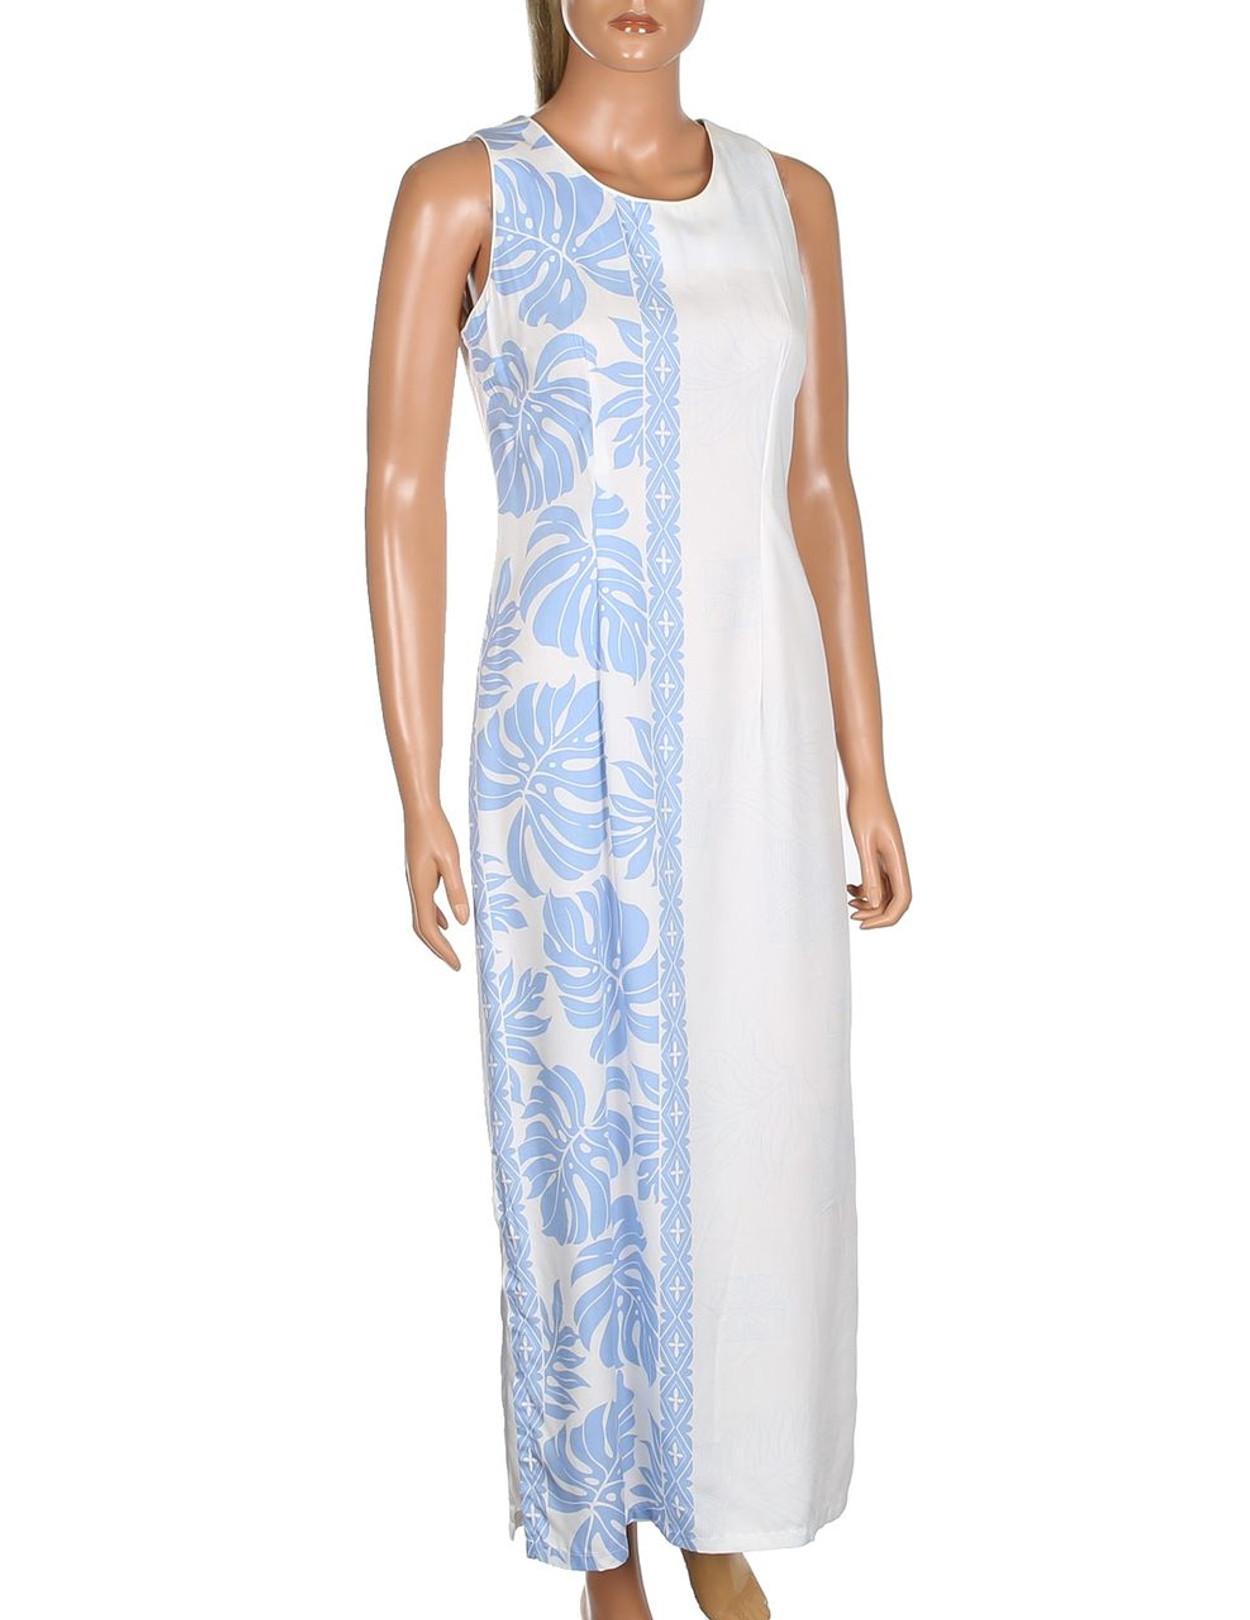 Prince Kuhio Design Long Hawaiian Wedding Dress Sleeveless